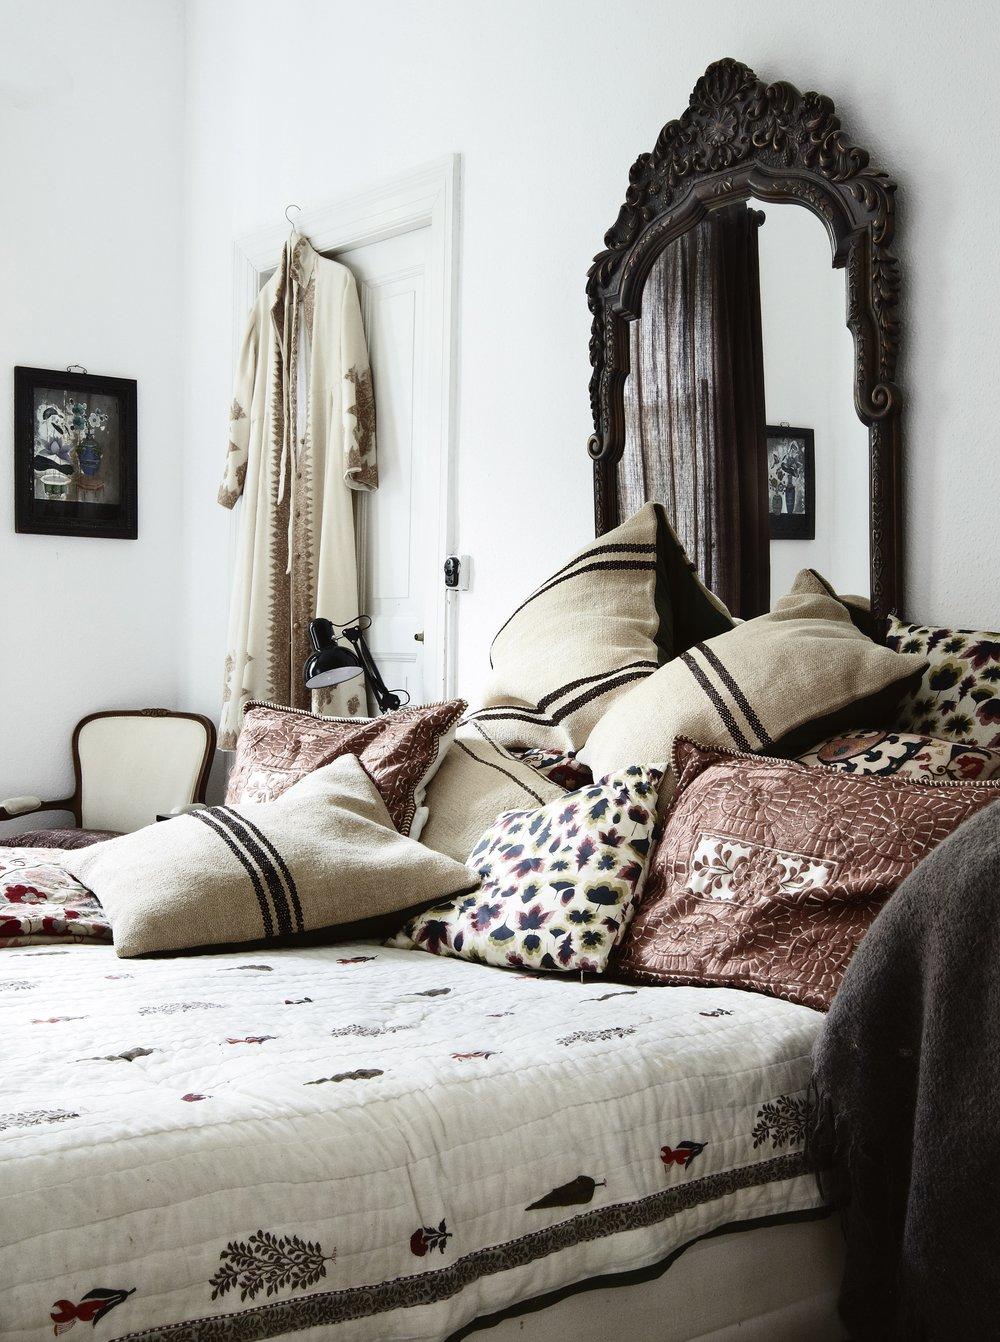 Heather Bullard | Styling 101: Neutral Pillows & Throws